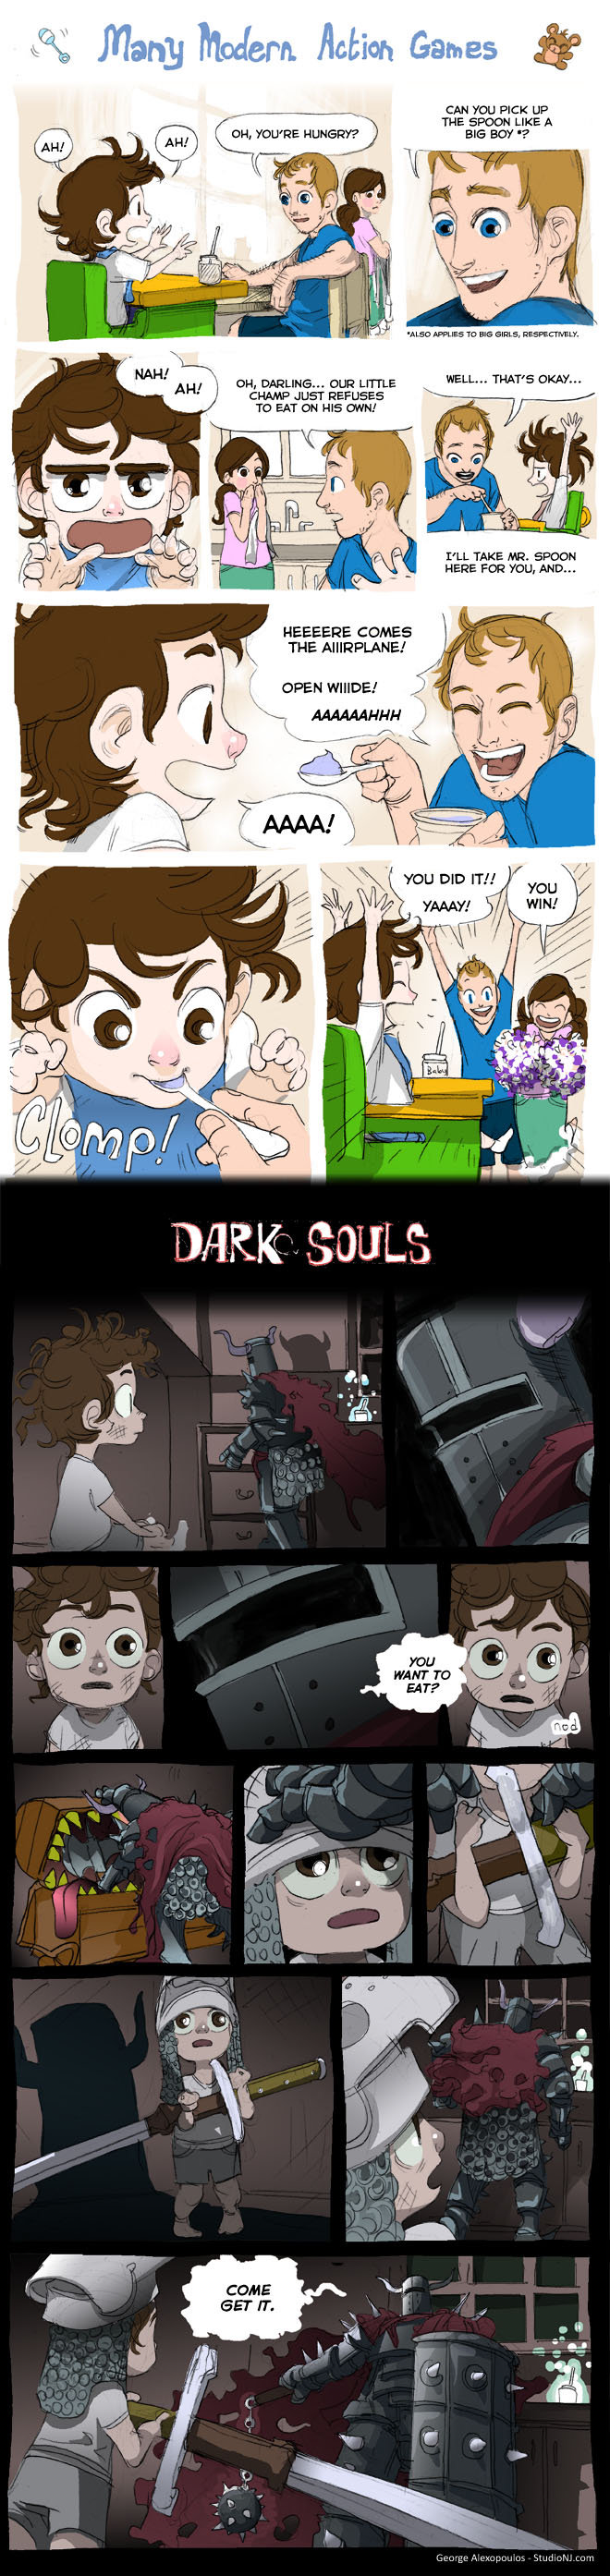 Action games vs Dark souls. tis be tru yo!. many Modern. Ration Gan. [/ l tiill''; CAN -rarety UP THE SPOON LIKE U. CHAMP JUST . TD EAT HIE URN! ELL TAKE ME'. S